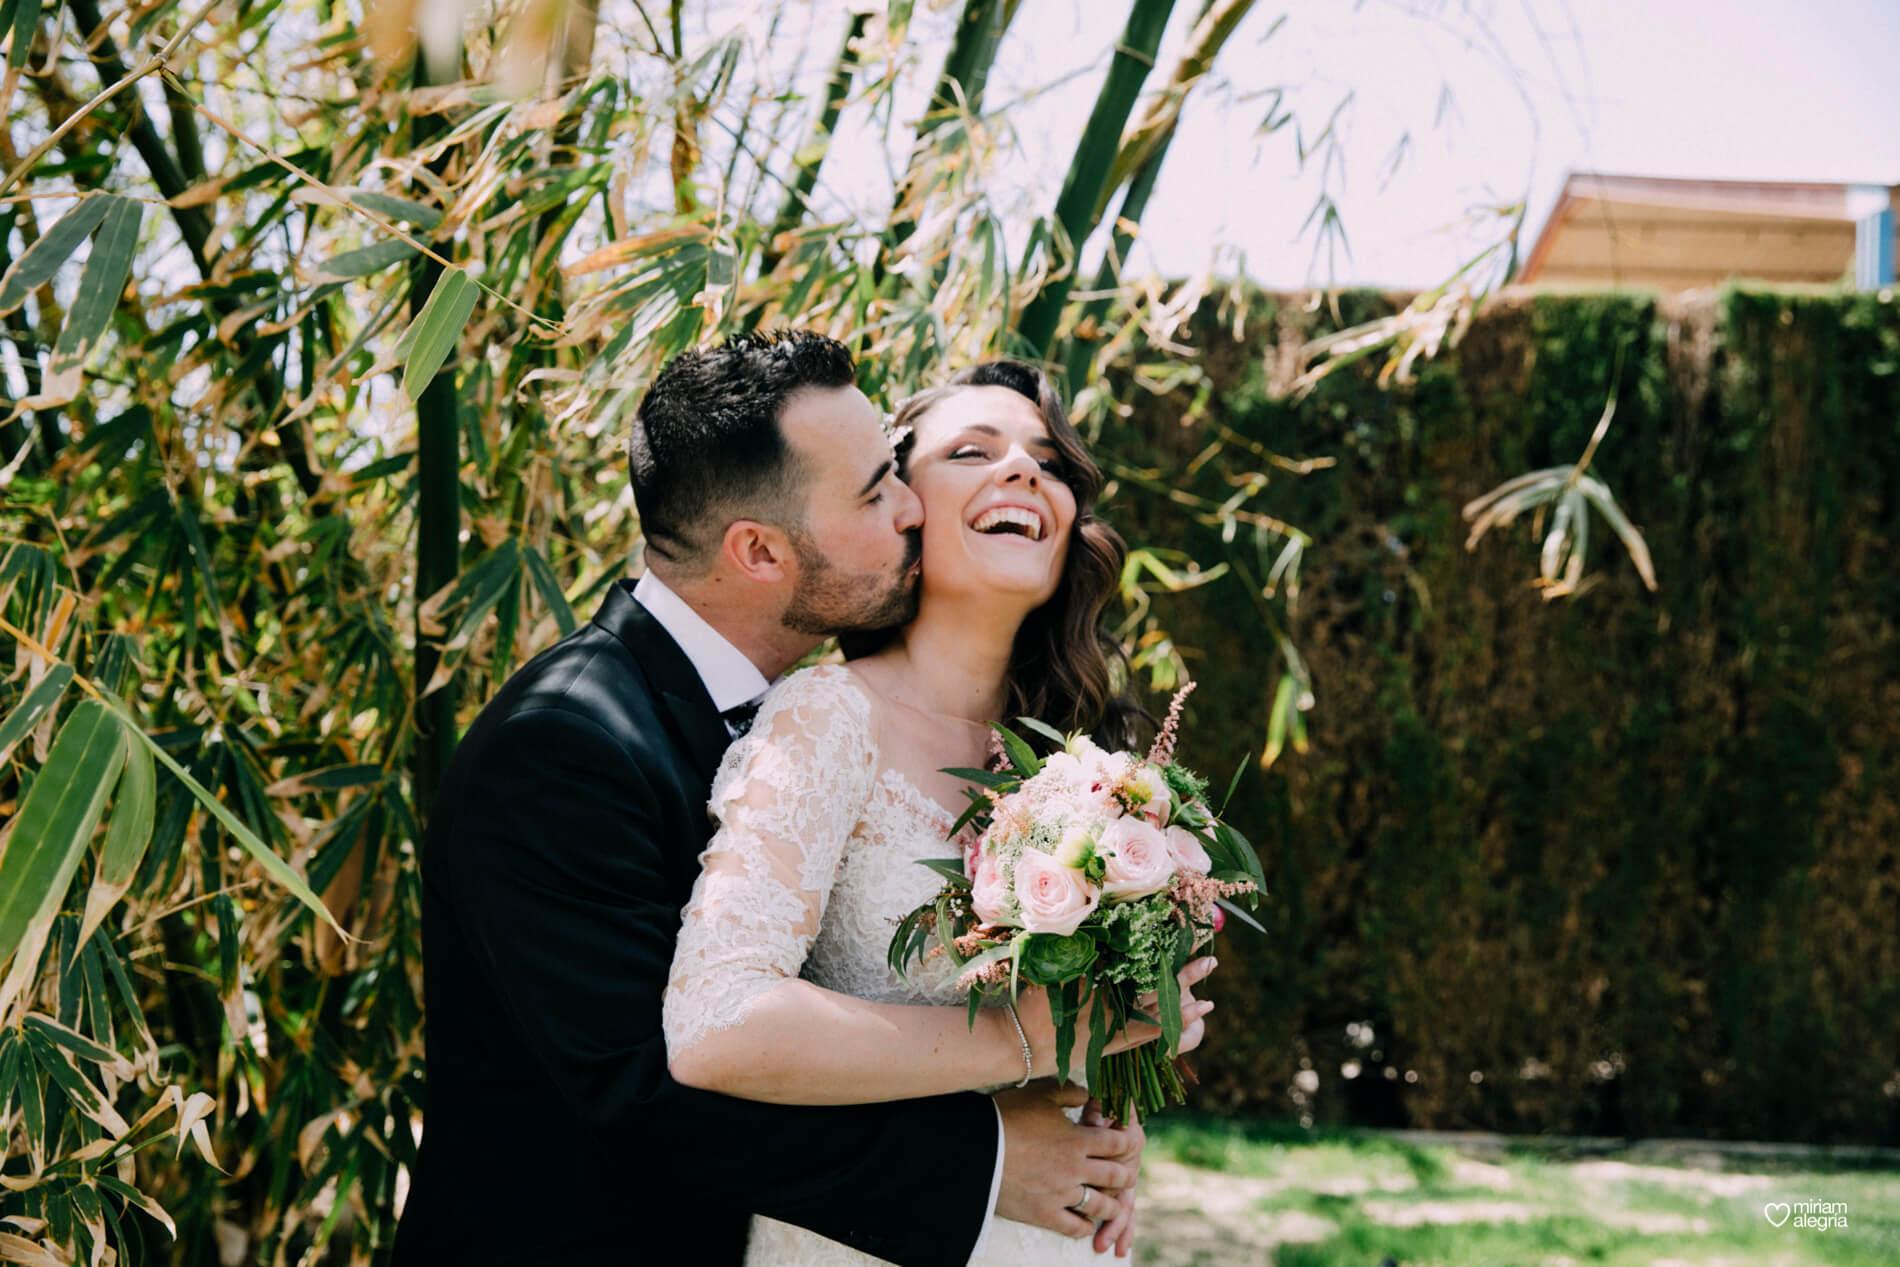 boda-en-finca-jurosa-miriam-alegria-86